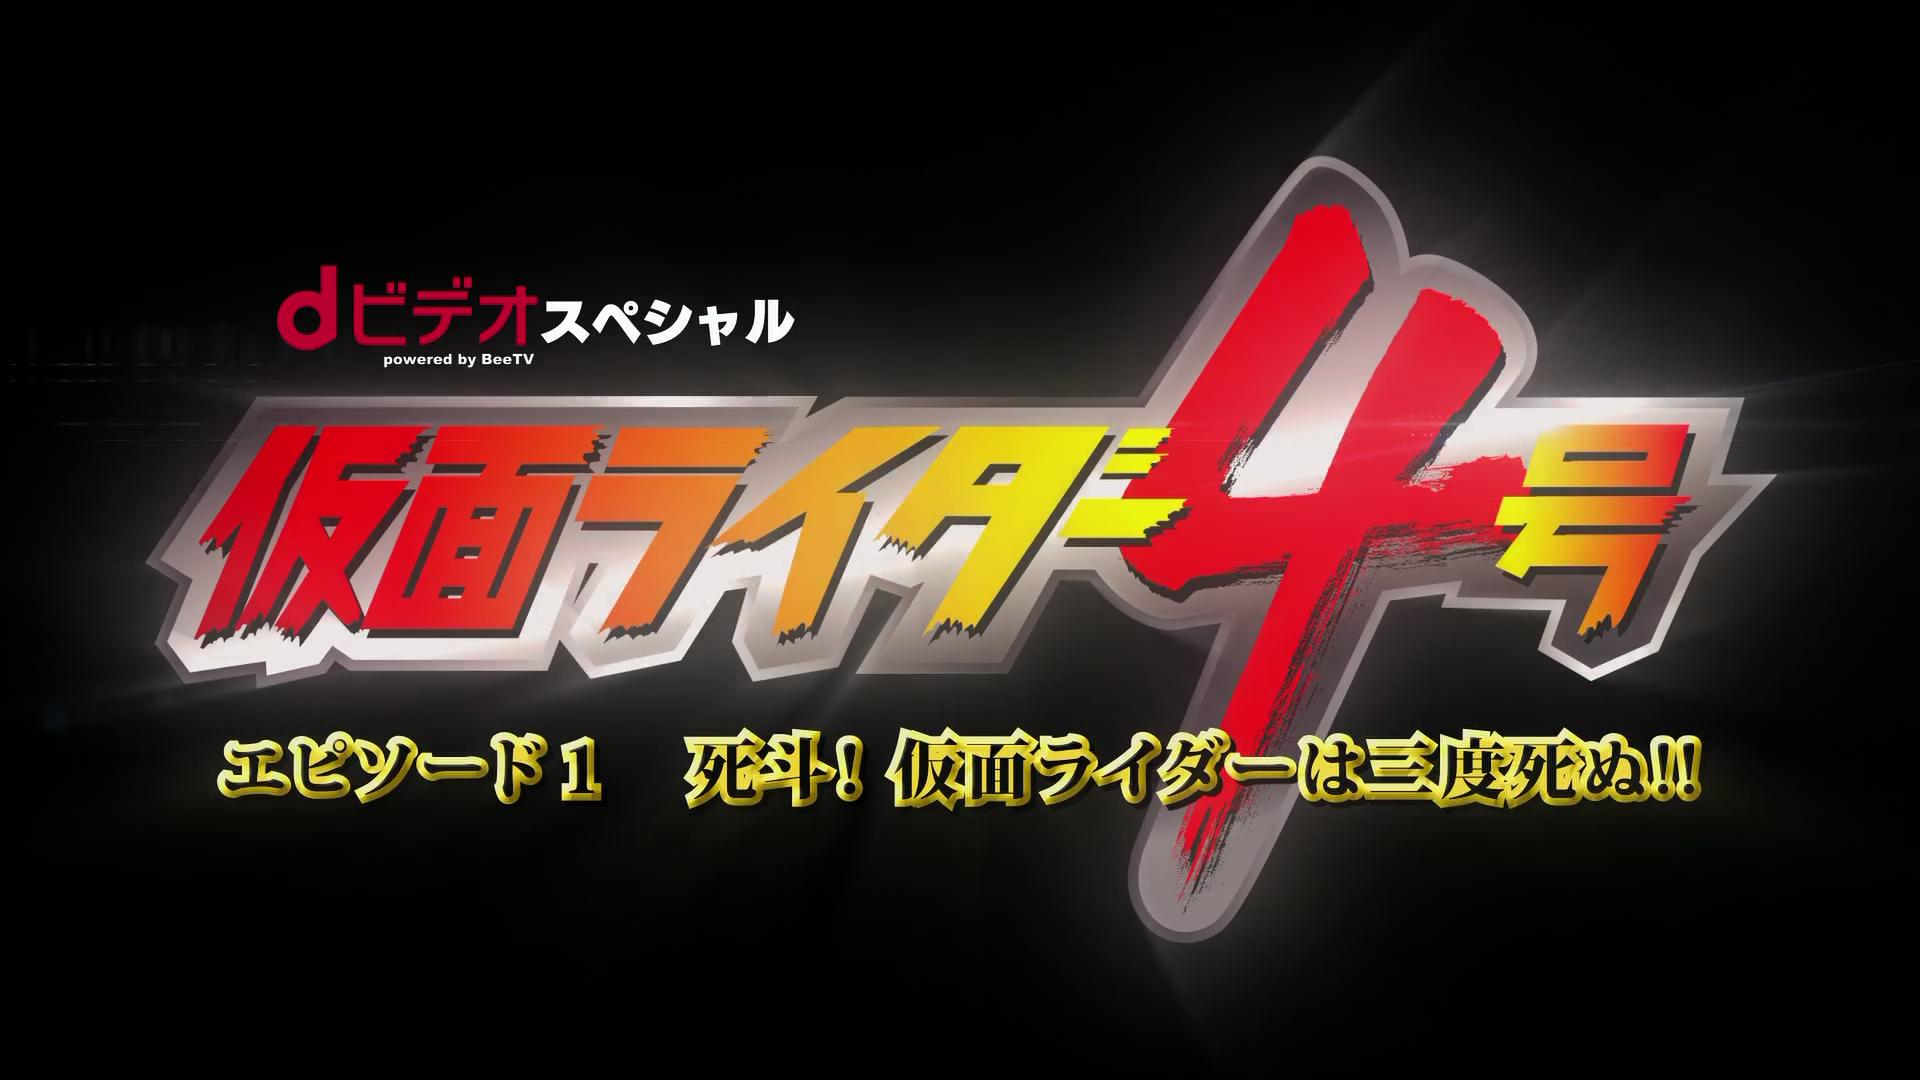 Deathmatch! The Kamen Rider Died Three Times!!